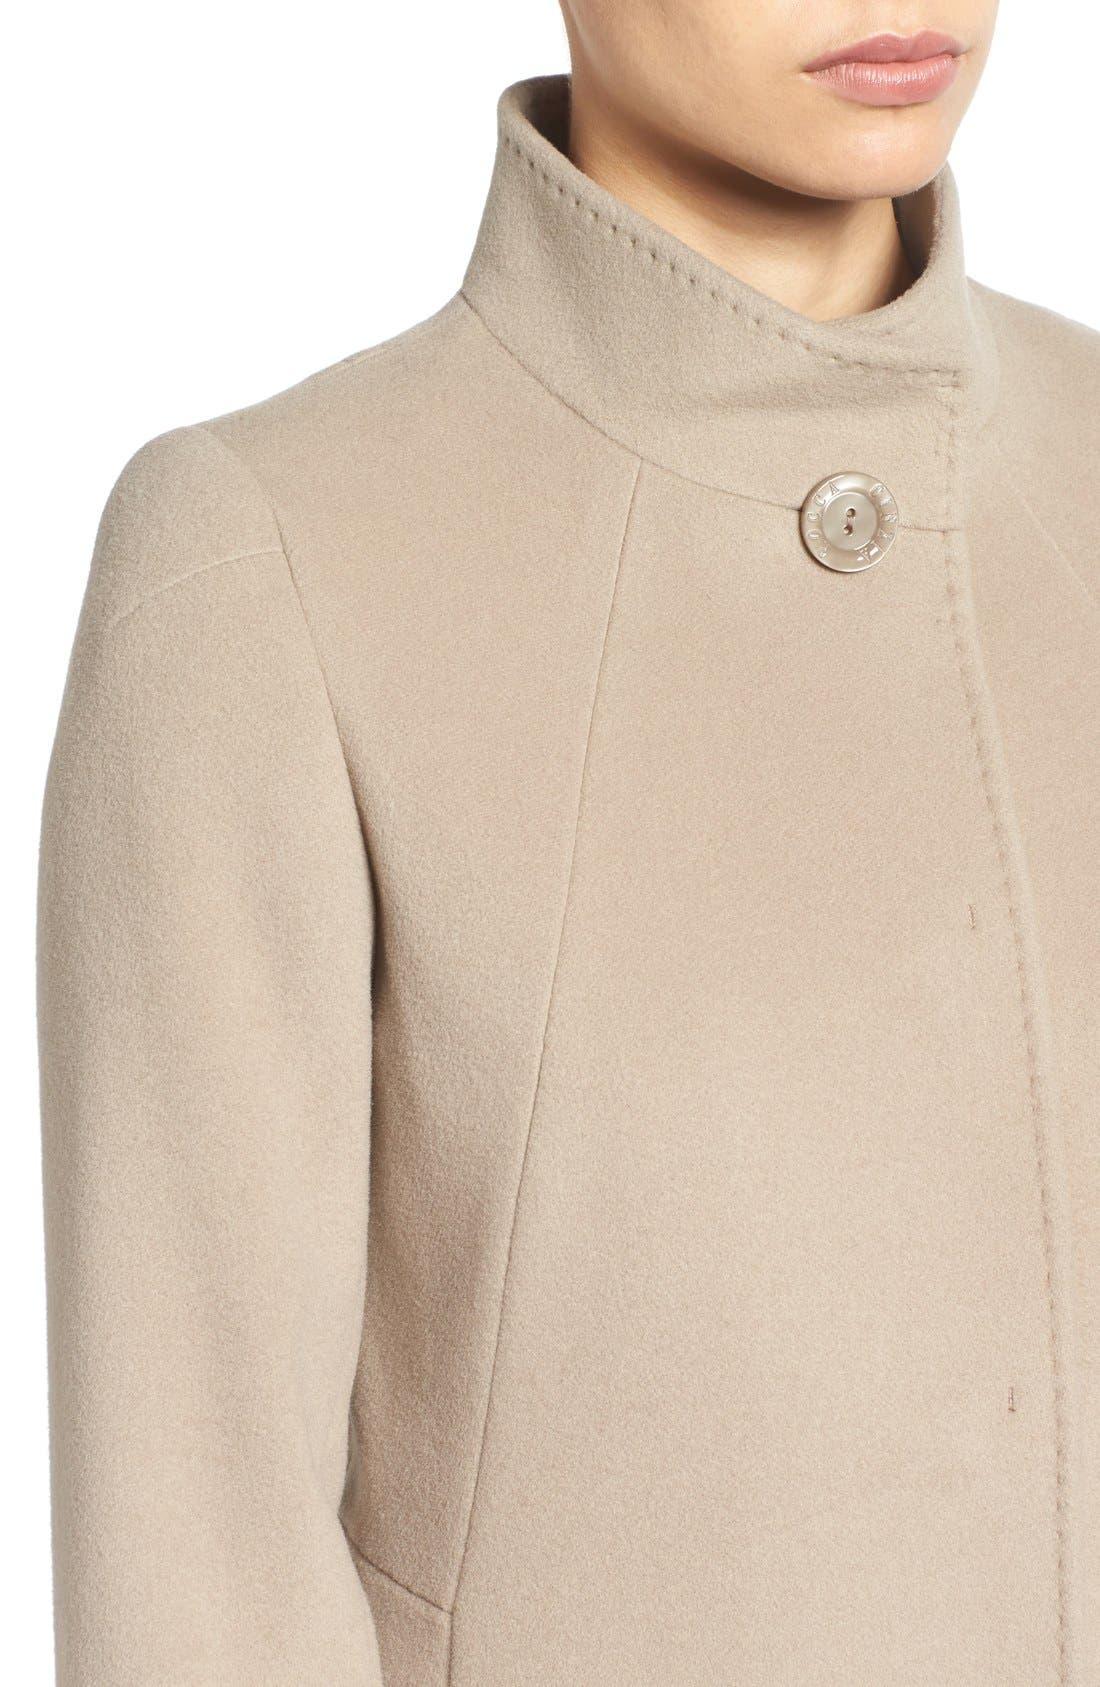 Cinzia Rocca Stand Collar Walking Coat,                             Alternate thumbnail 8, color,